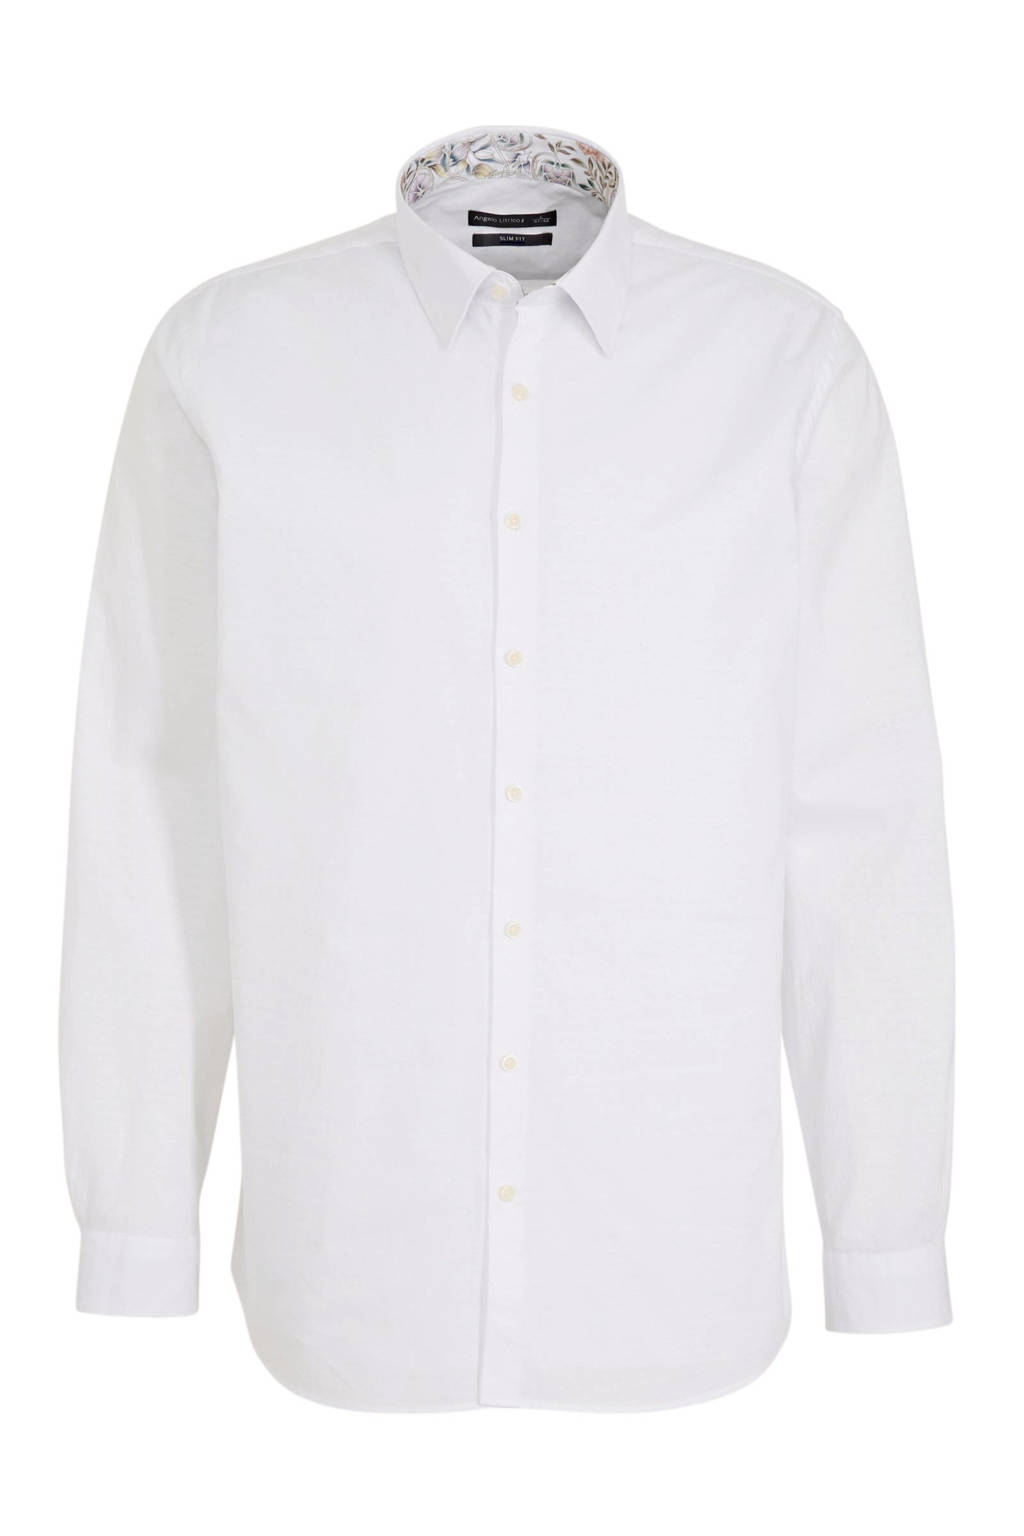 C&A Angelo Litrico slim fit overhemd wit met ruitjes print, Wit